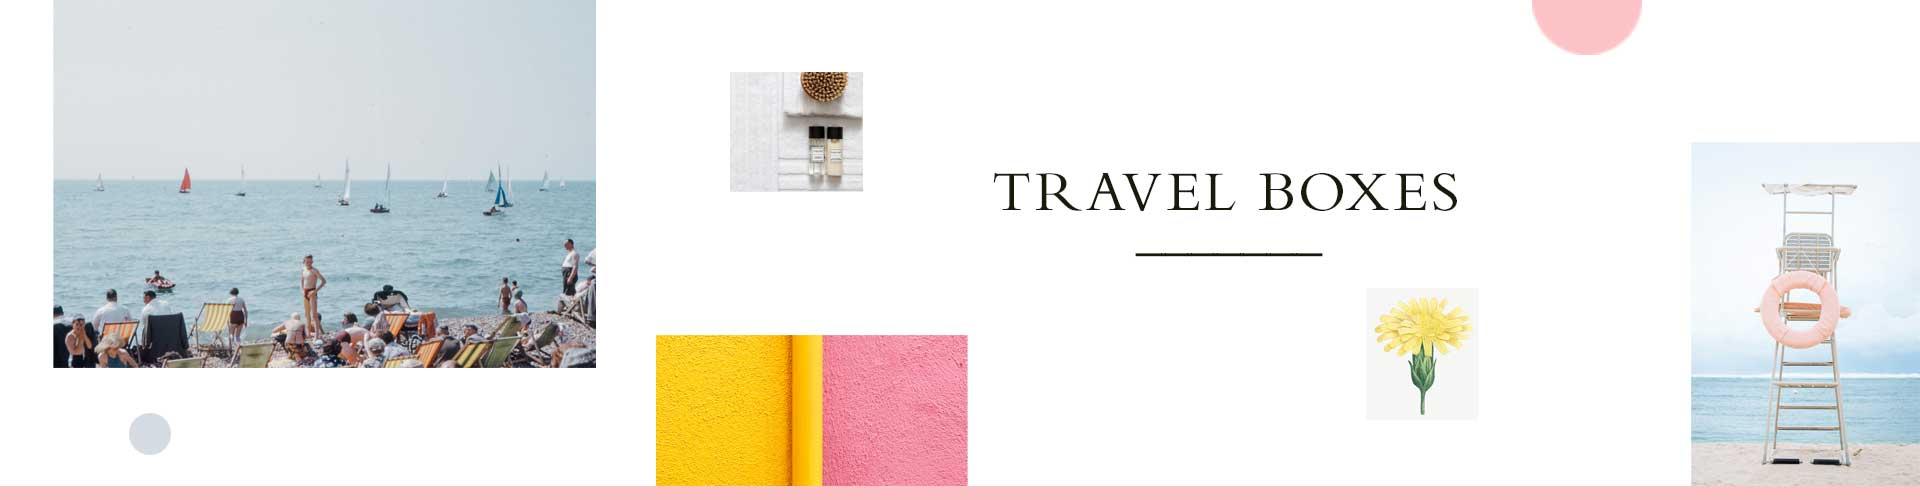 Travel Boxes